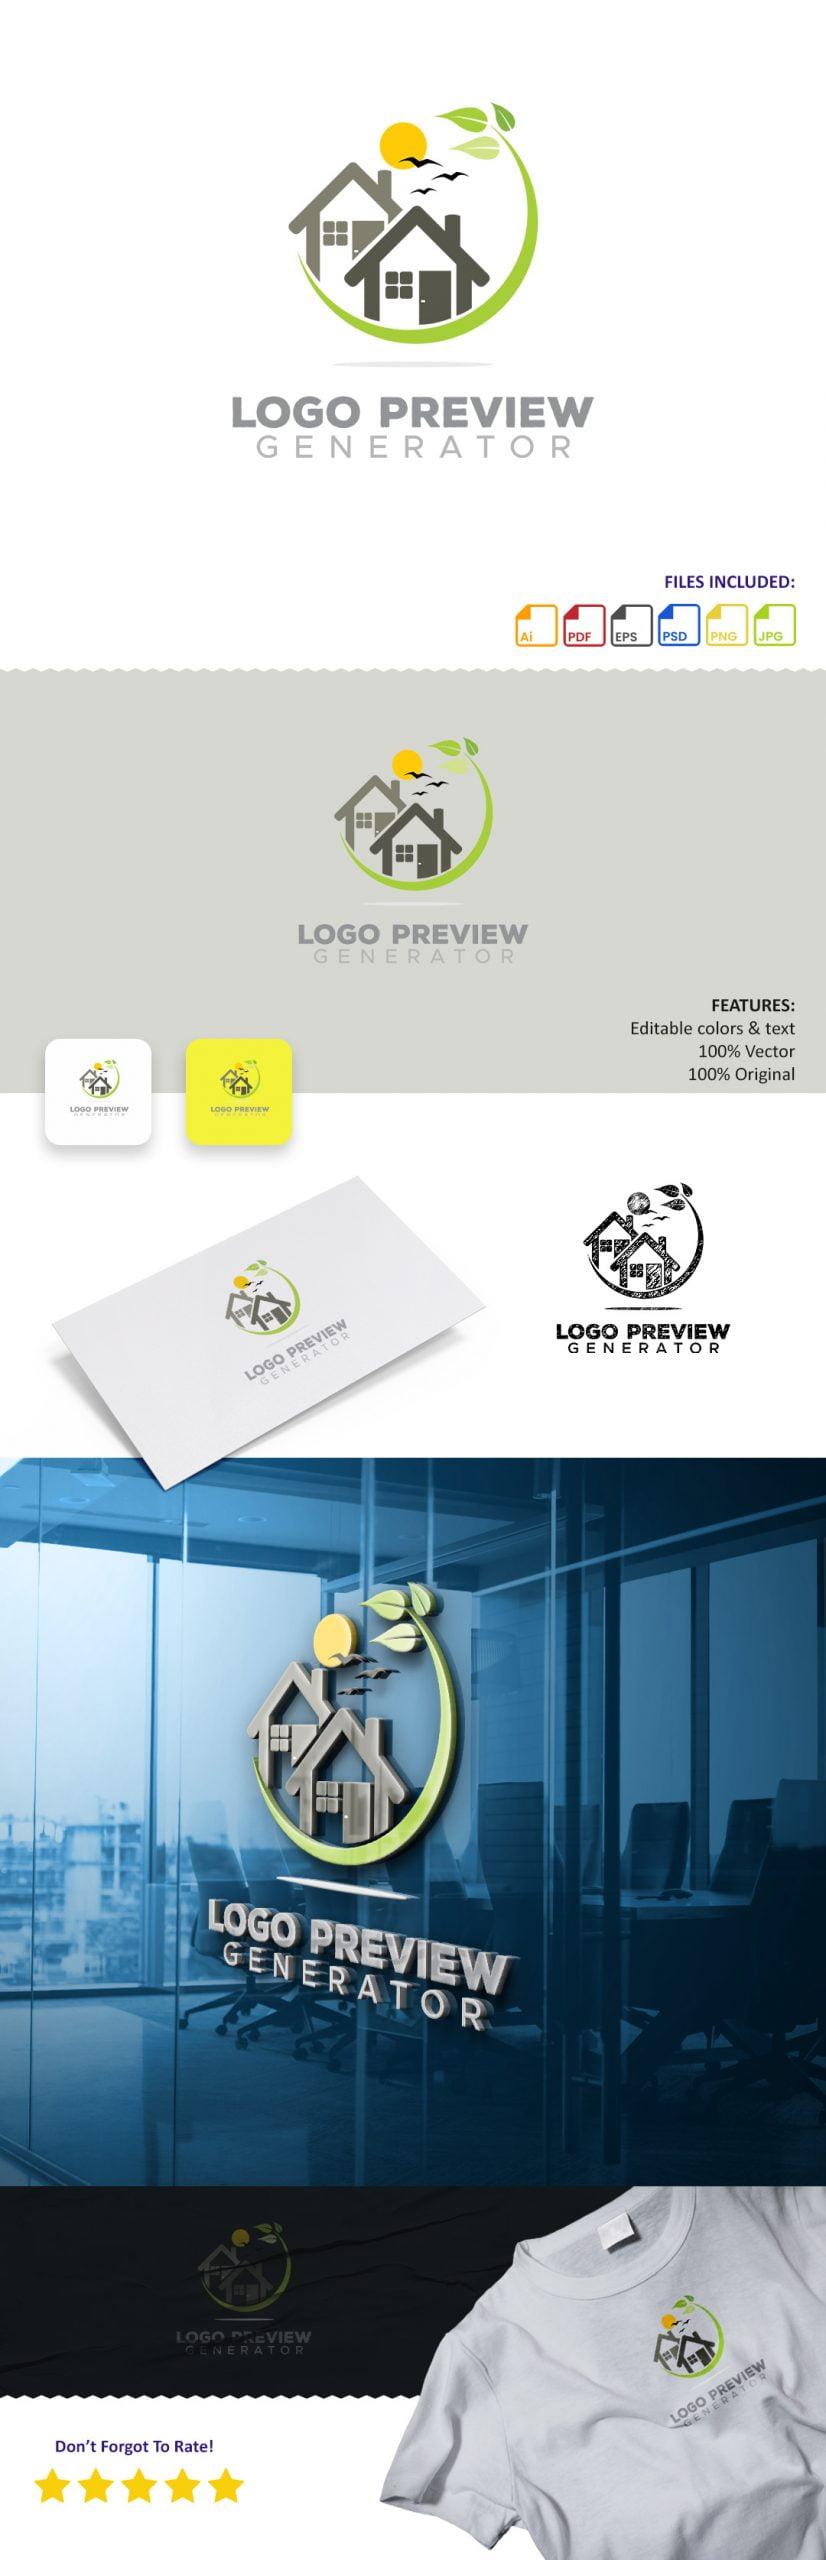 Free-Download-Logo-Preview-Image-Generator